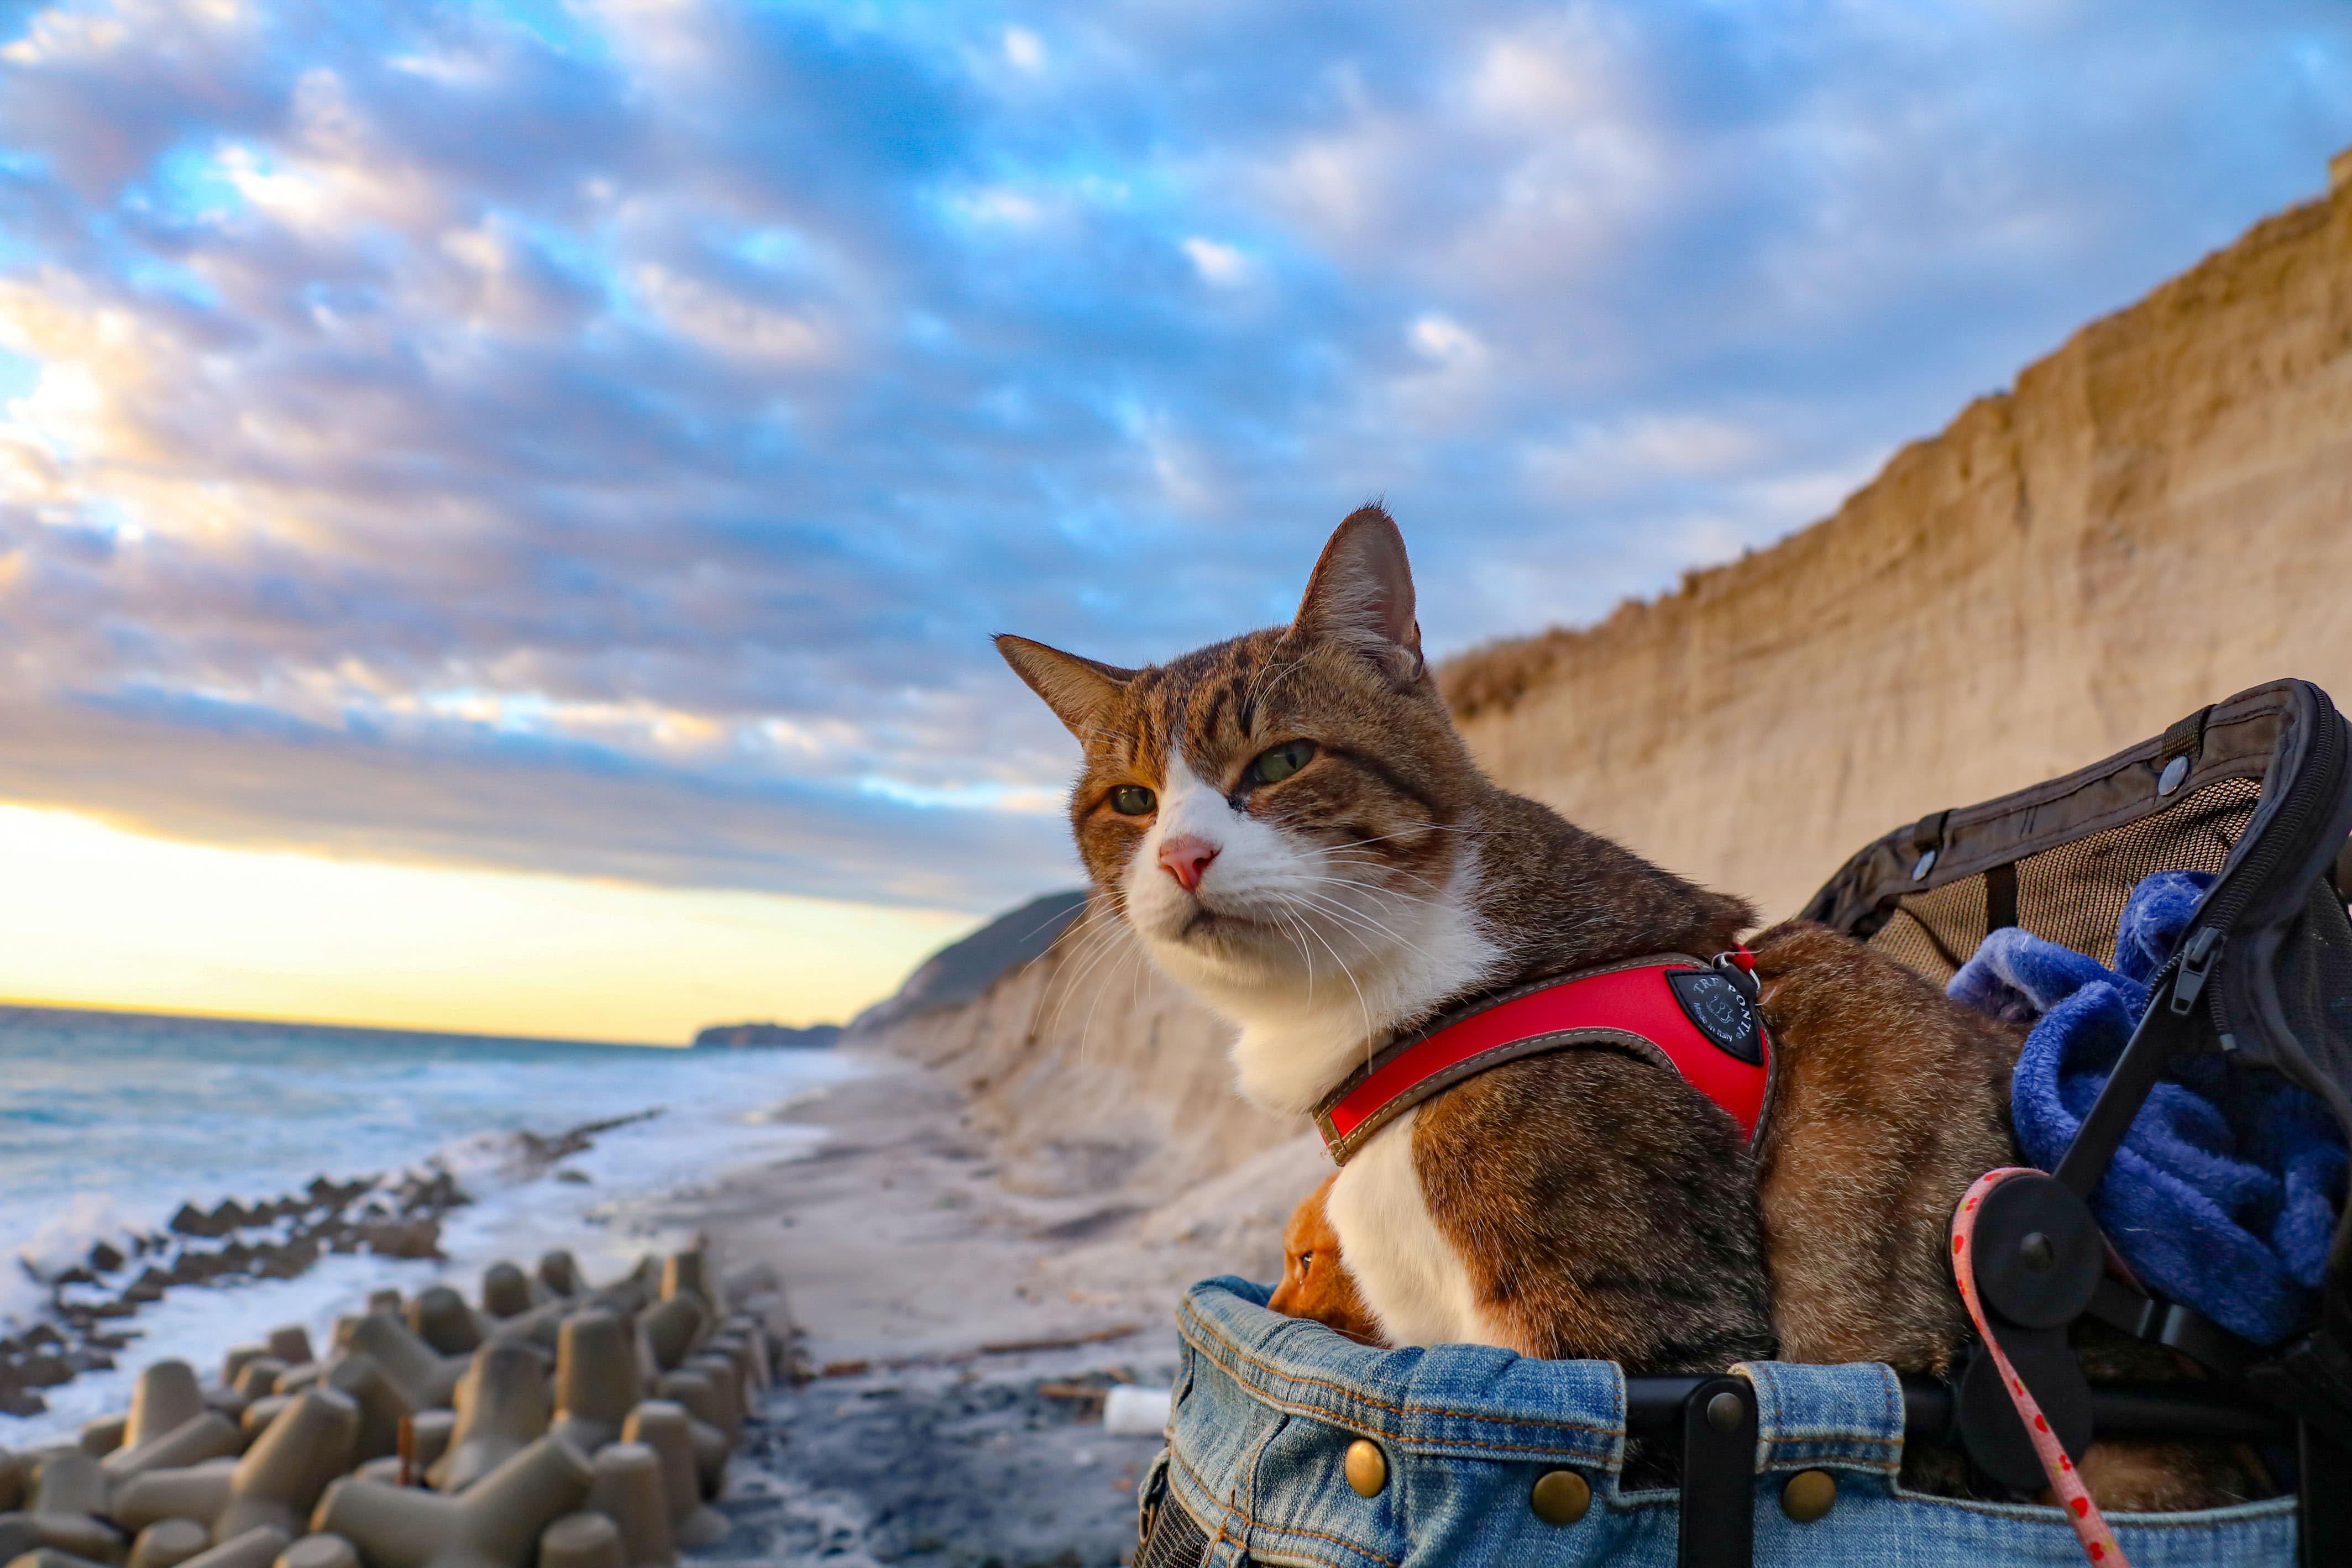 <p>Daikichi on a Japanese beach on his travels wih Daisuke Nagasawa. (Photo: Daisuke Nagasawa/Caters News) </p>